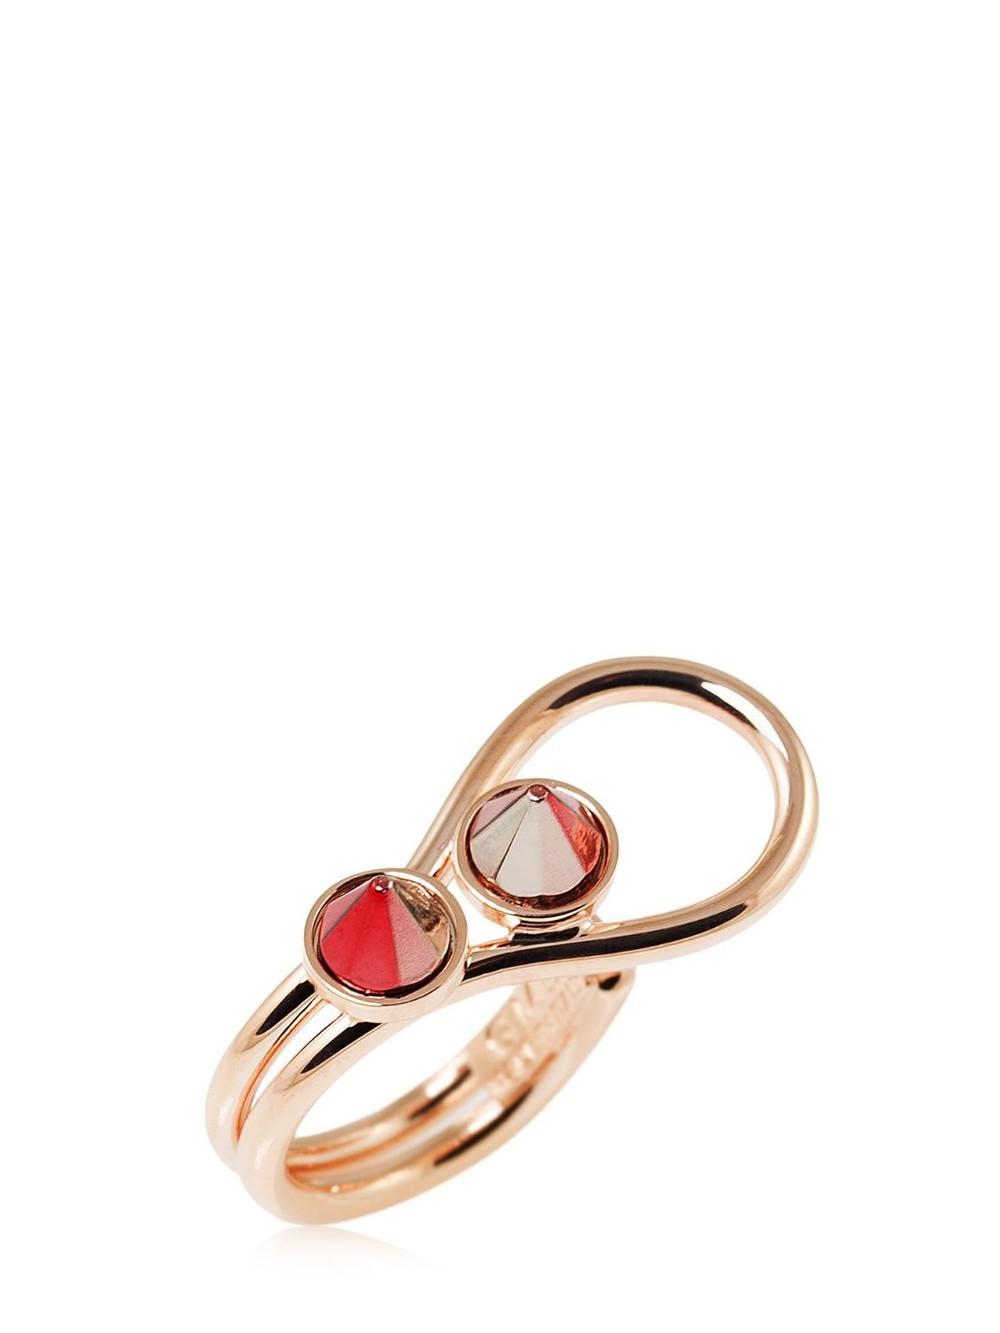 GIULIANA MANCINELLI Mocker Ring in gold / rose